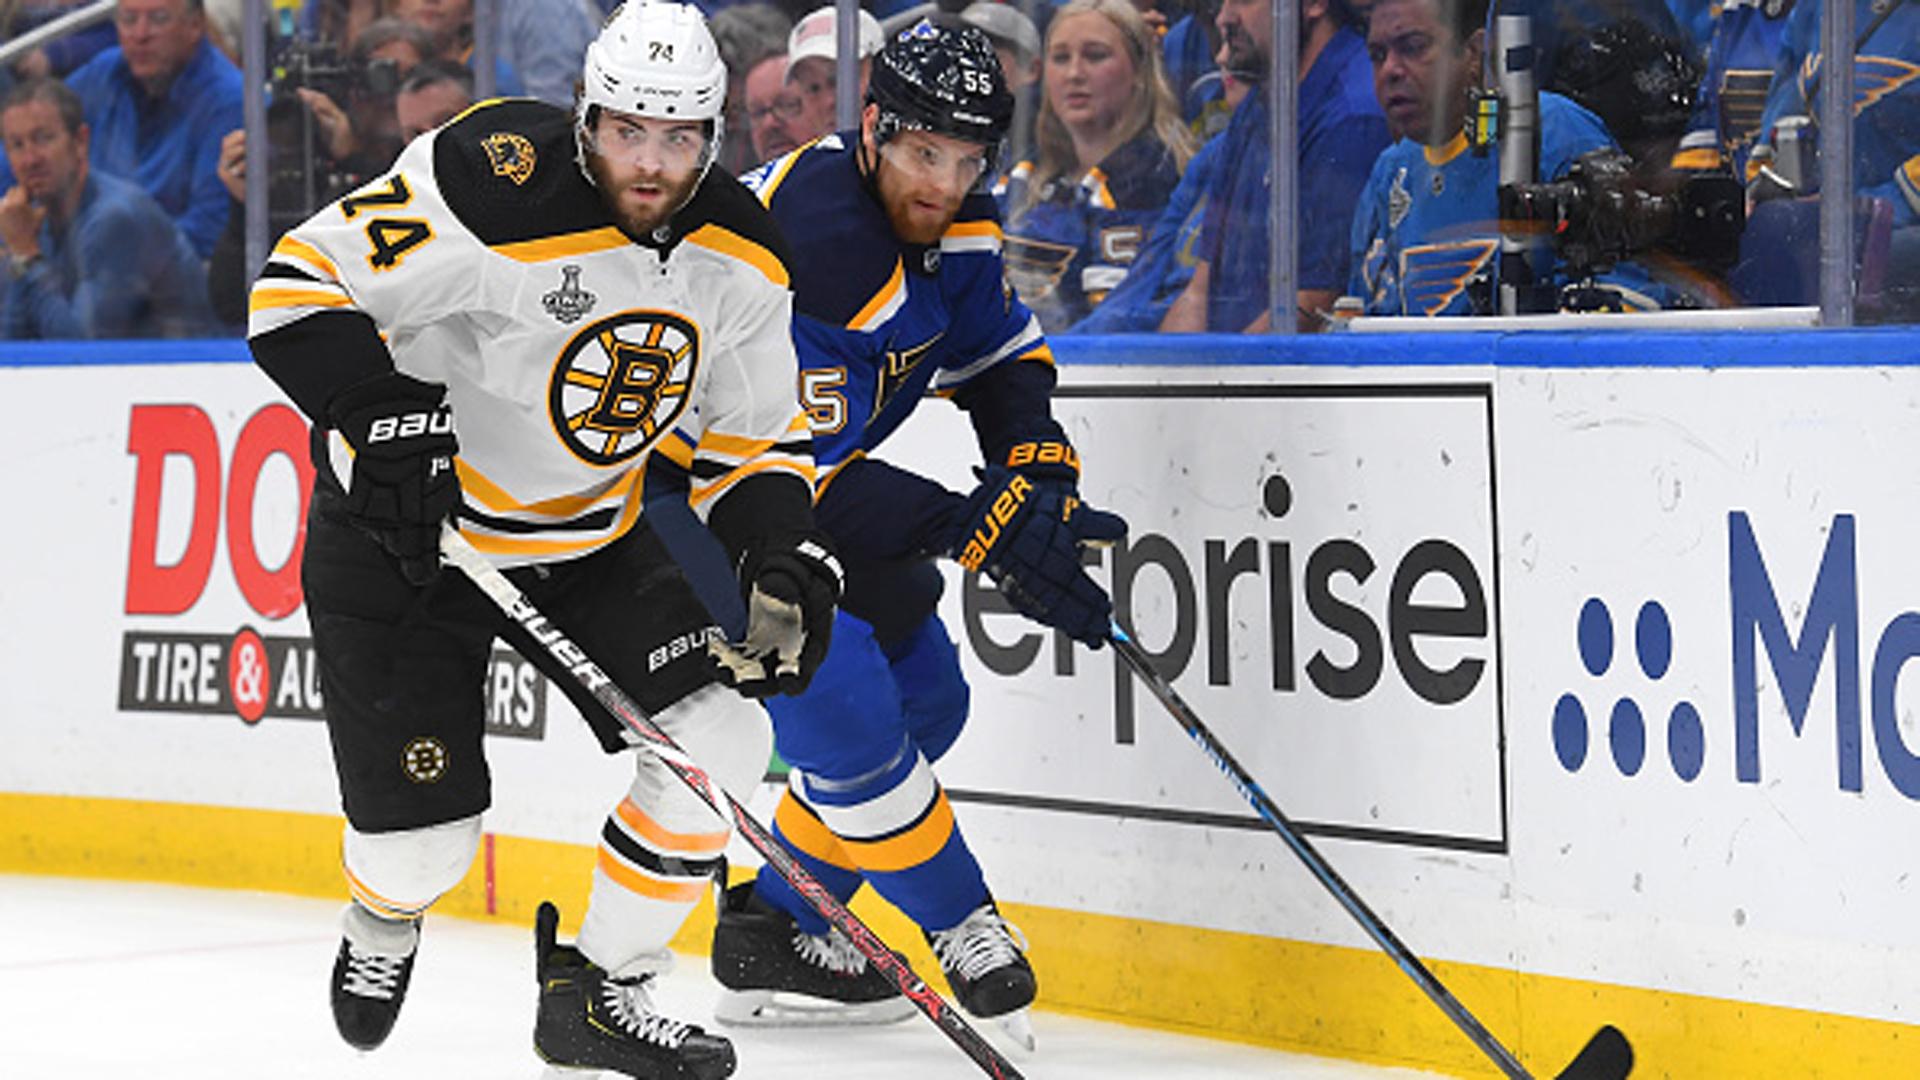 DeBrusk's stellar effort critical in Bruins' Game 6 victory